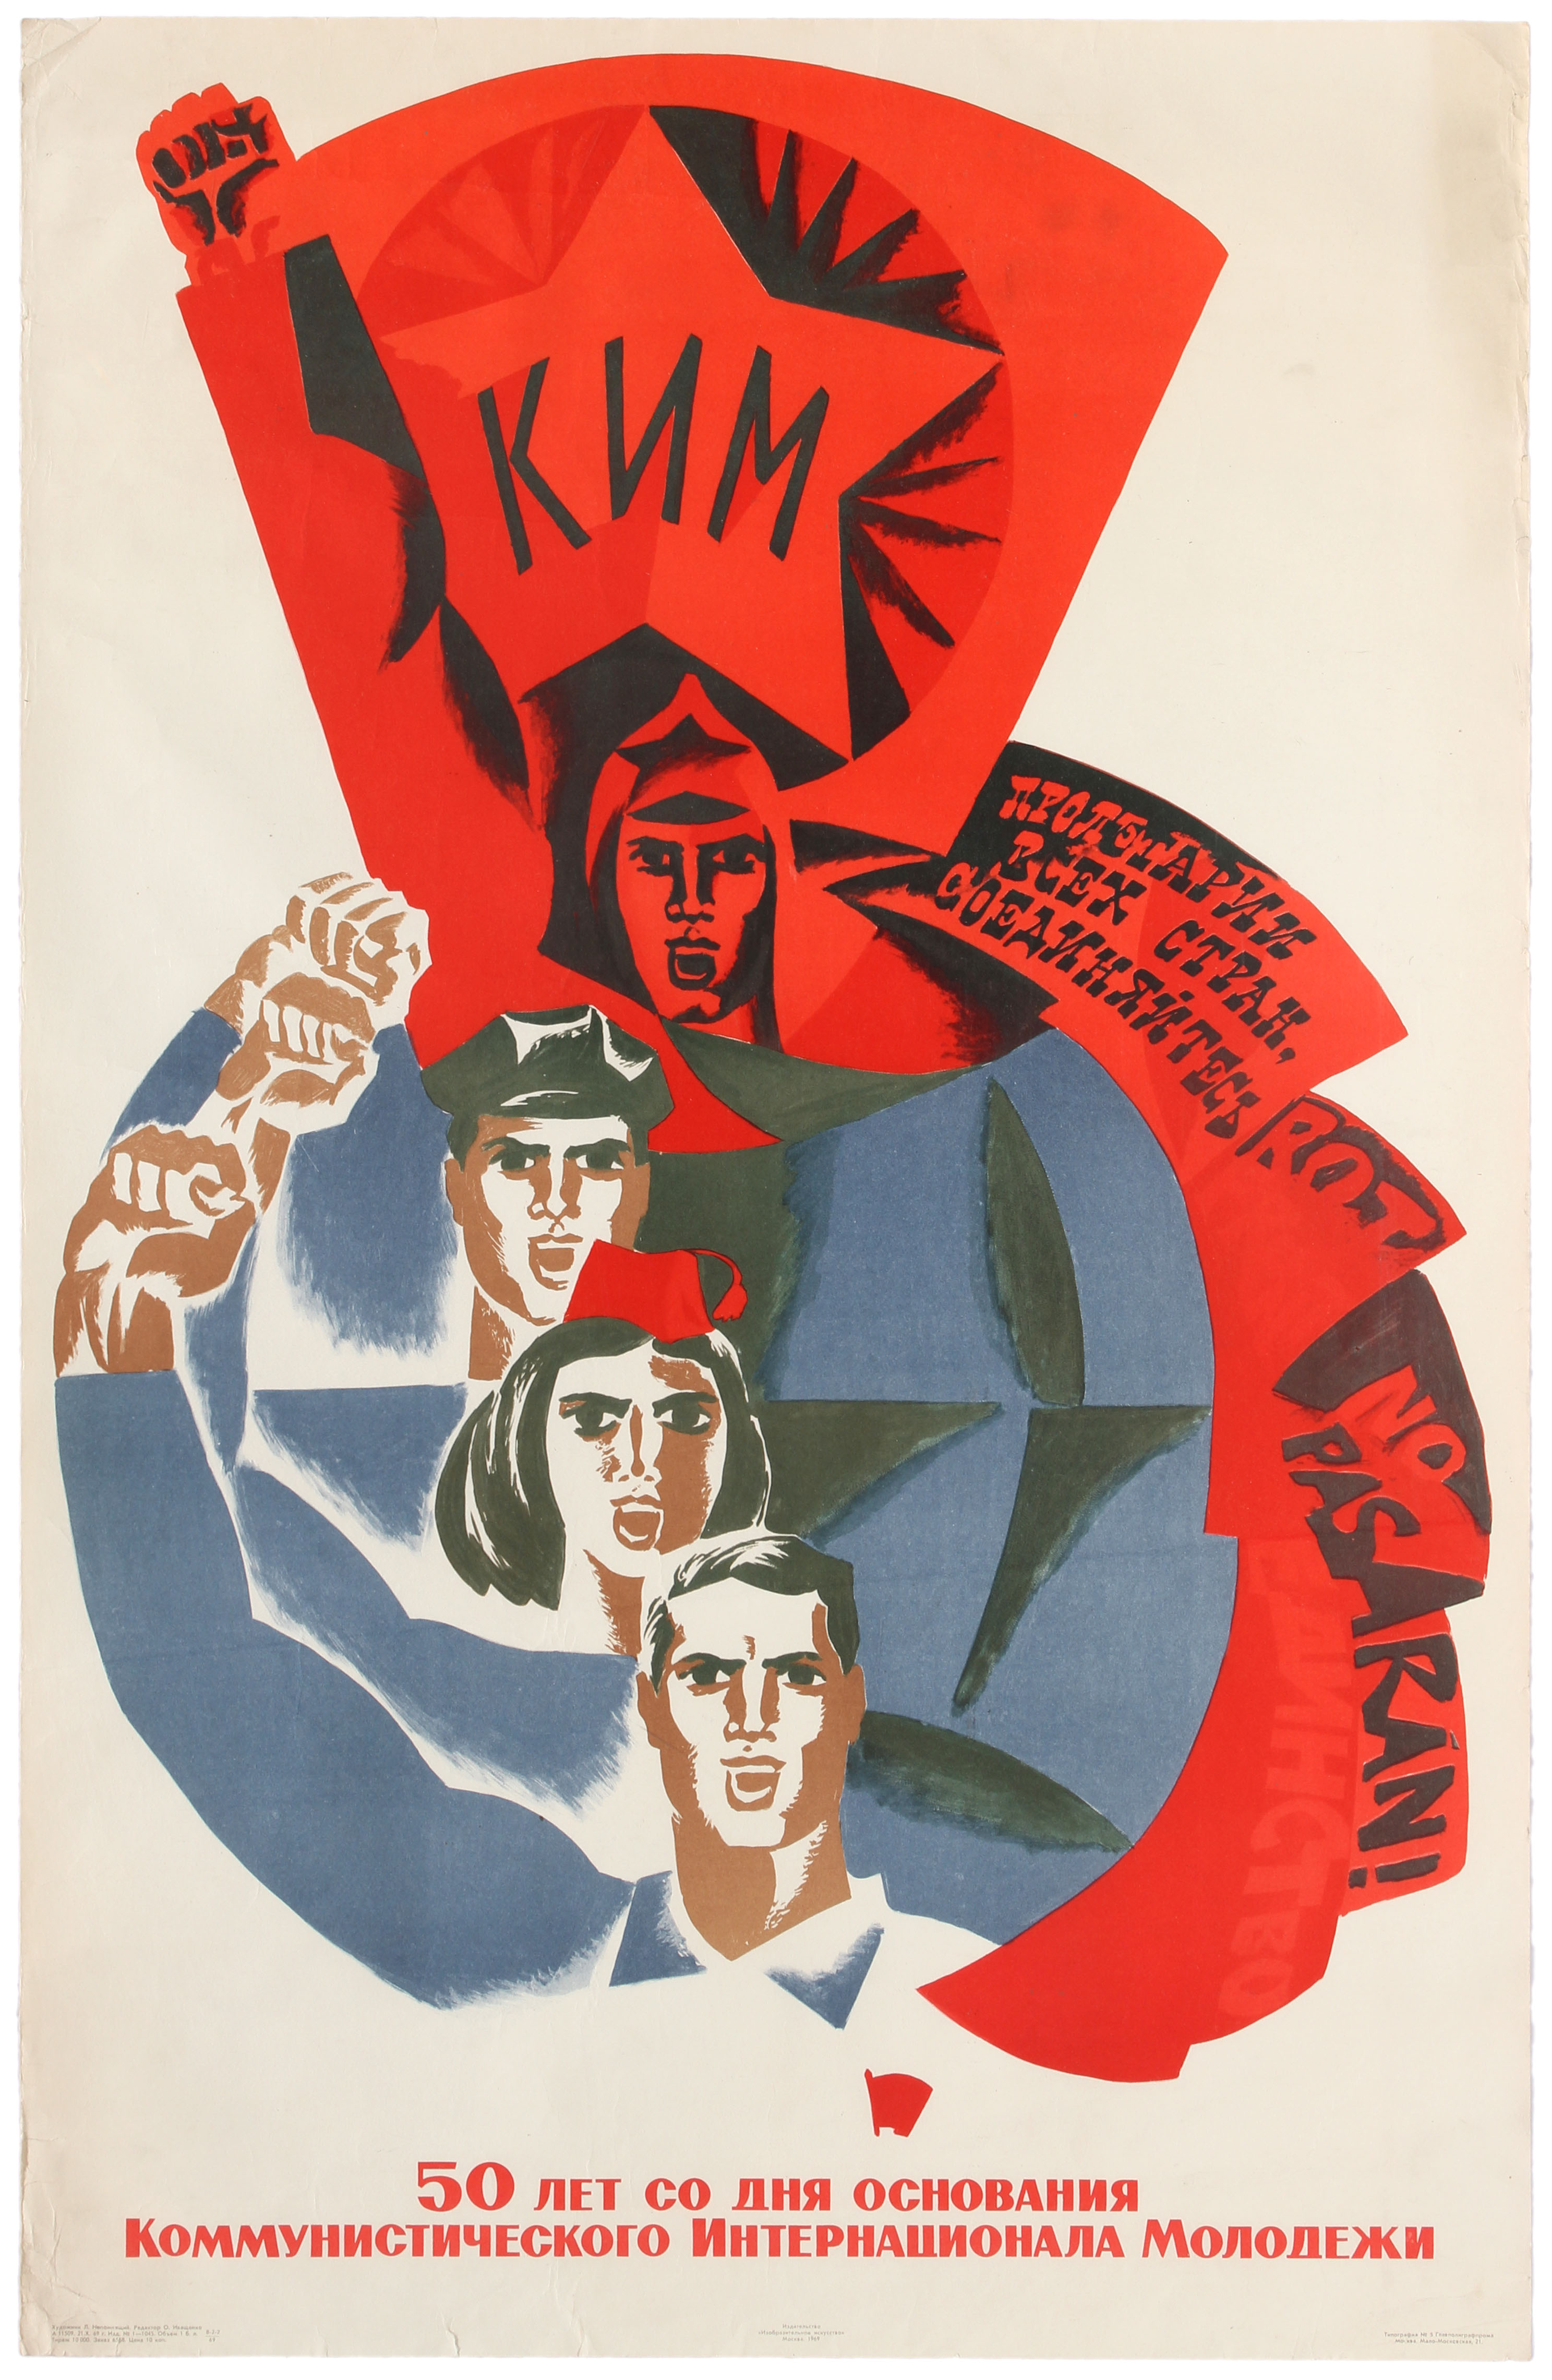 Lot 54 - Set 3 Propaganda Posters USSR Communist Party Lenin Youth